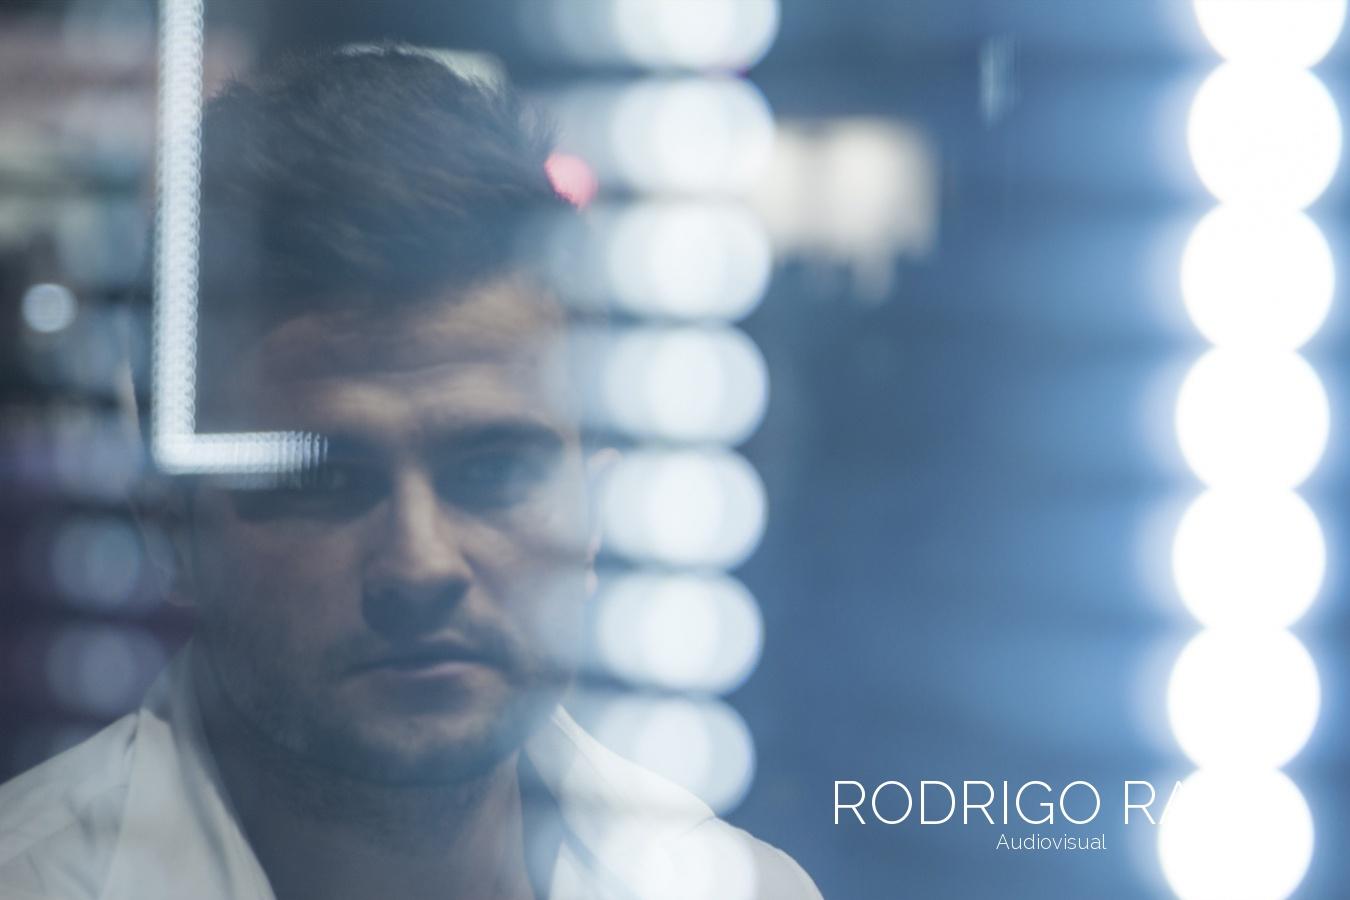 Remi - Rodrigo Rada, Audiovisual